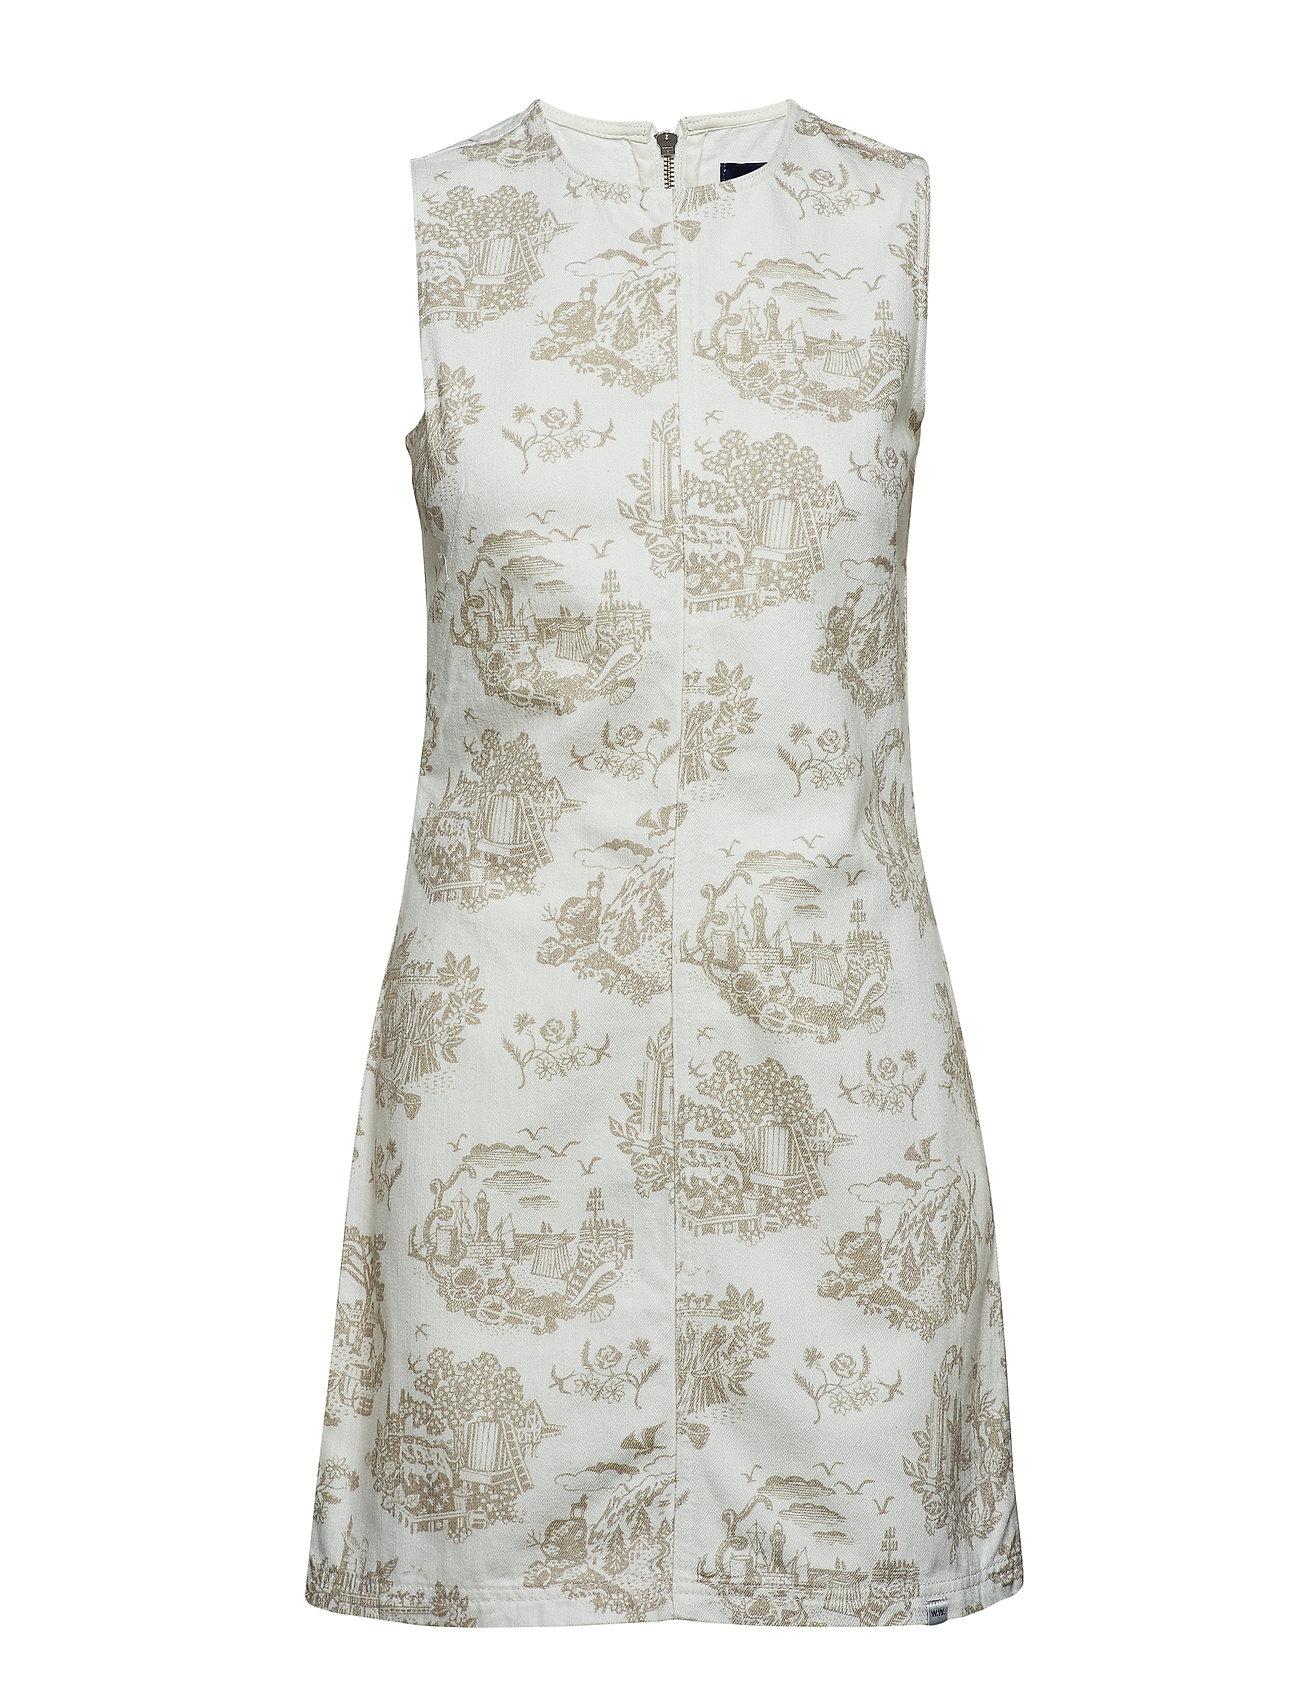 Wood Wood Amy dress - OFF-WHITE